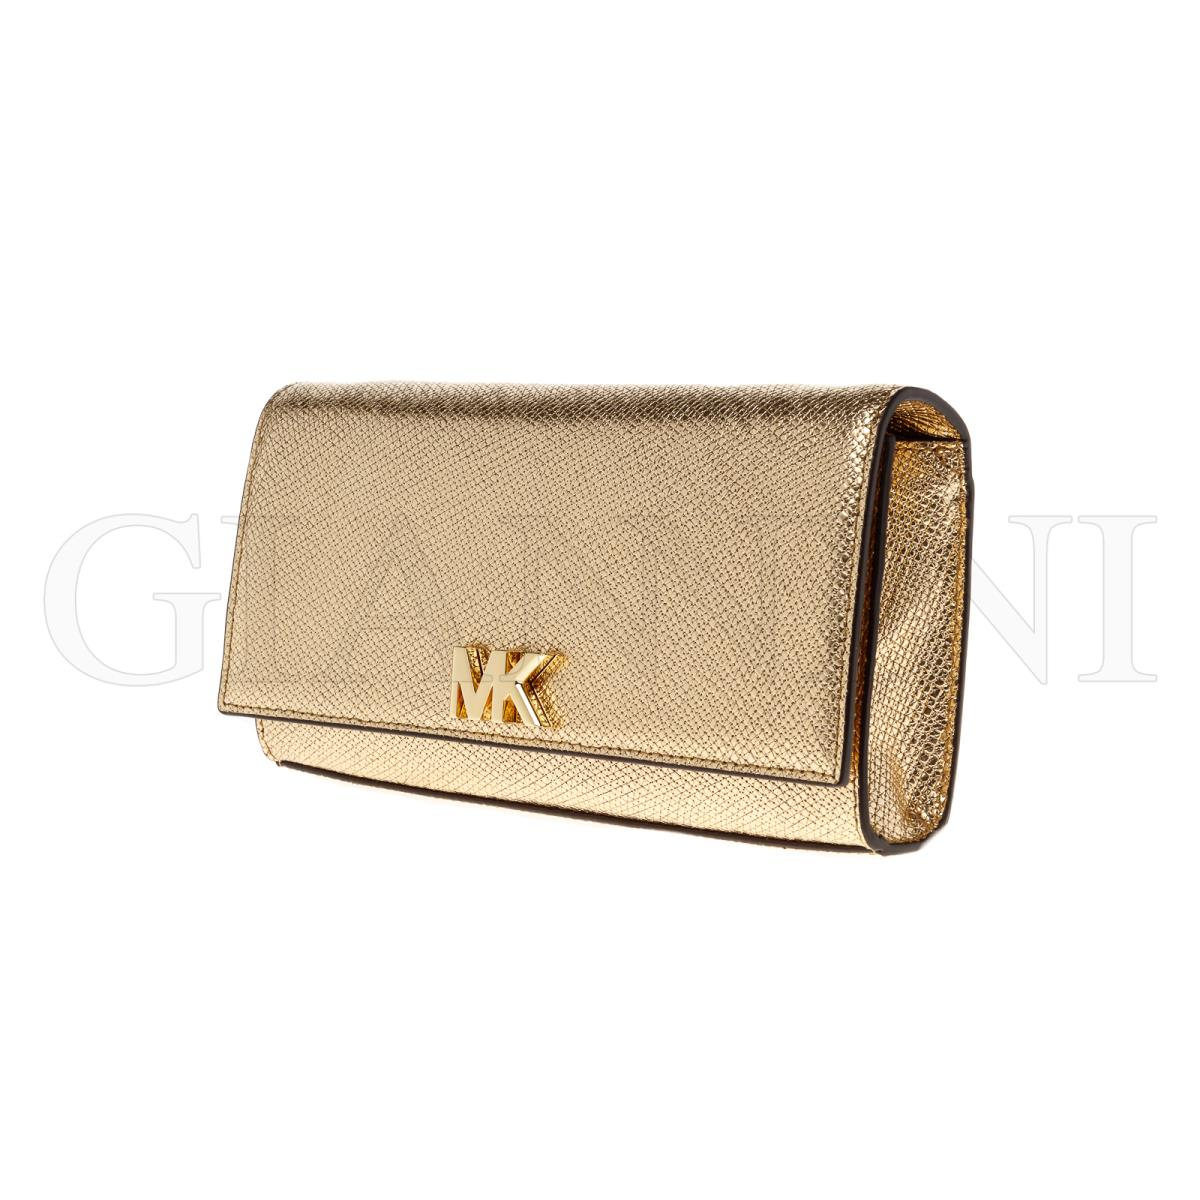 9b590cb2a27b7b ... store mk michael kors clutch bag. 22500 7d94d 57078